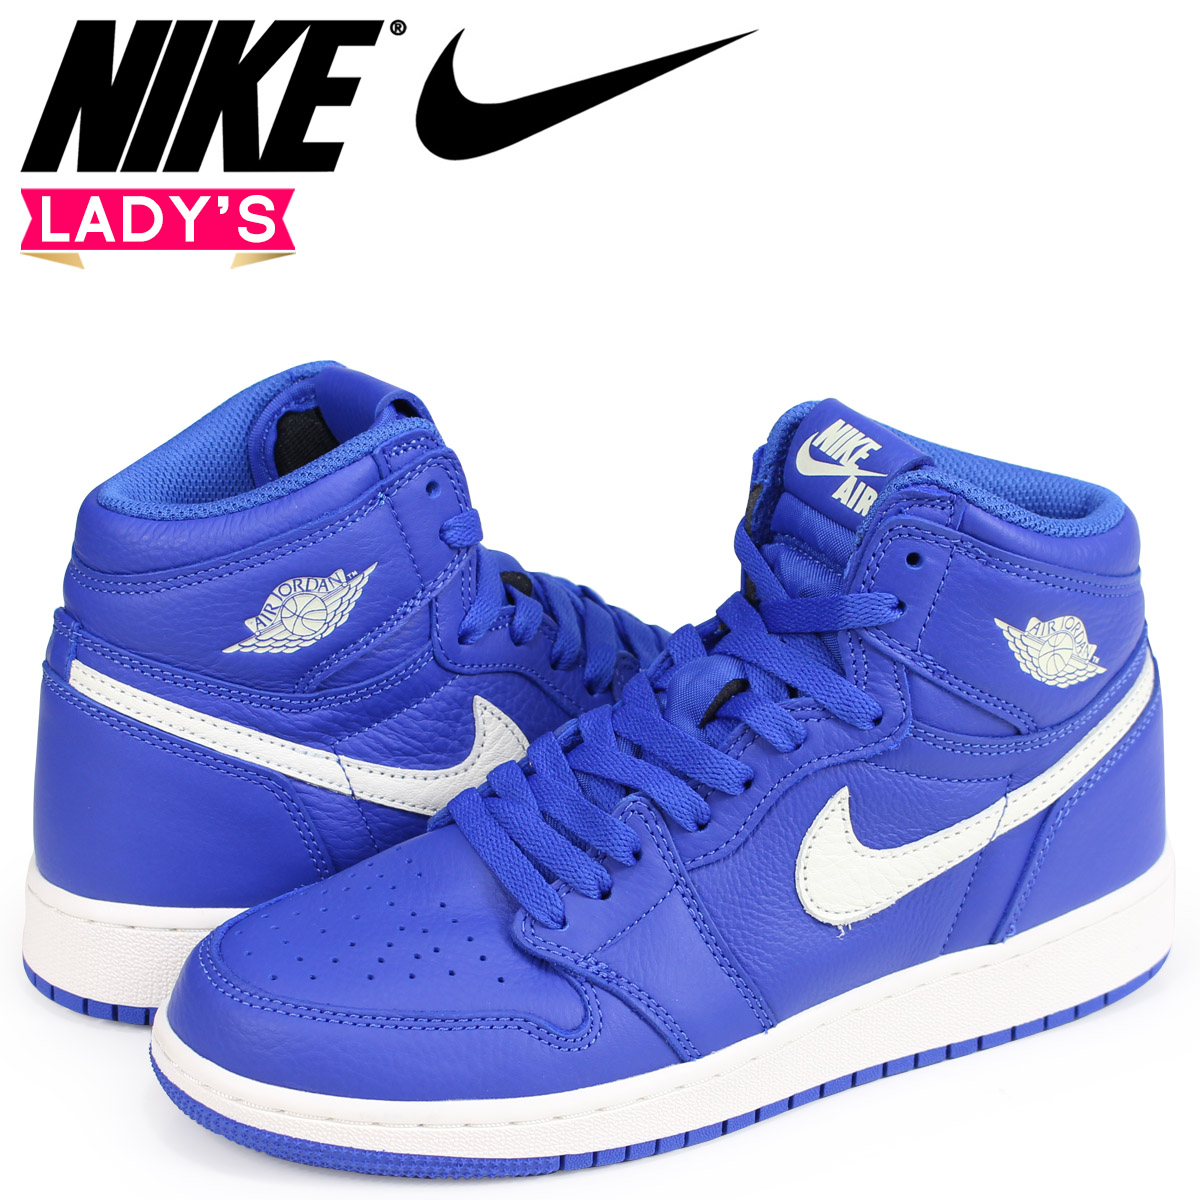 GS Hyper Royal Blue Sail 575441-401 Youth NEW Nike Air Jordan 1 Retro High OG